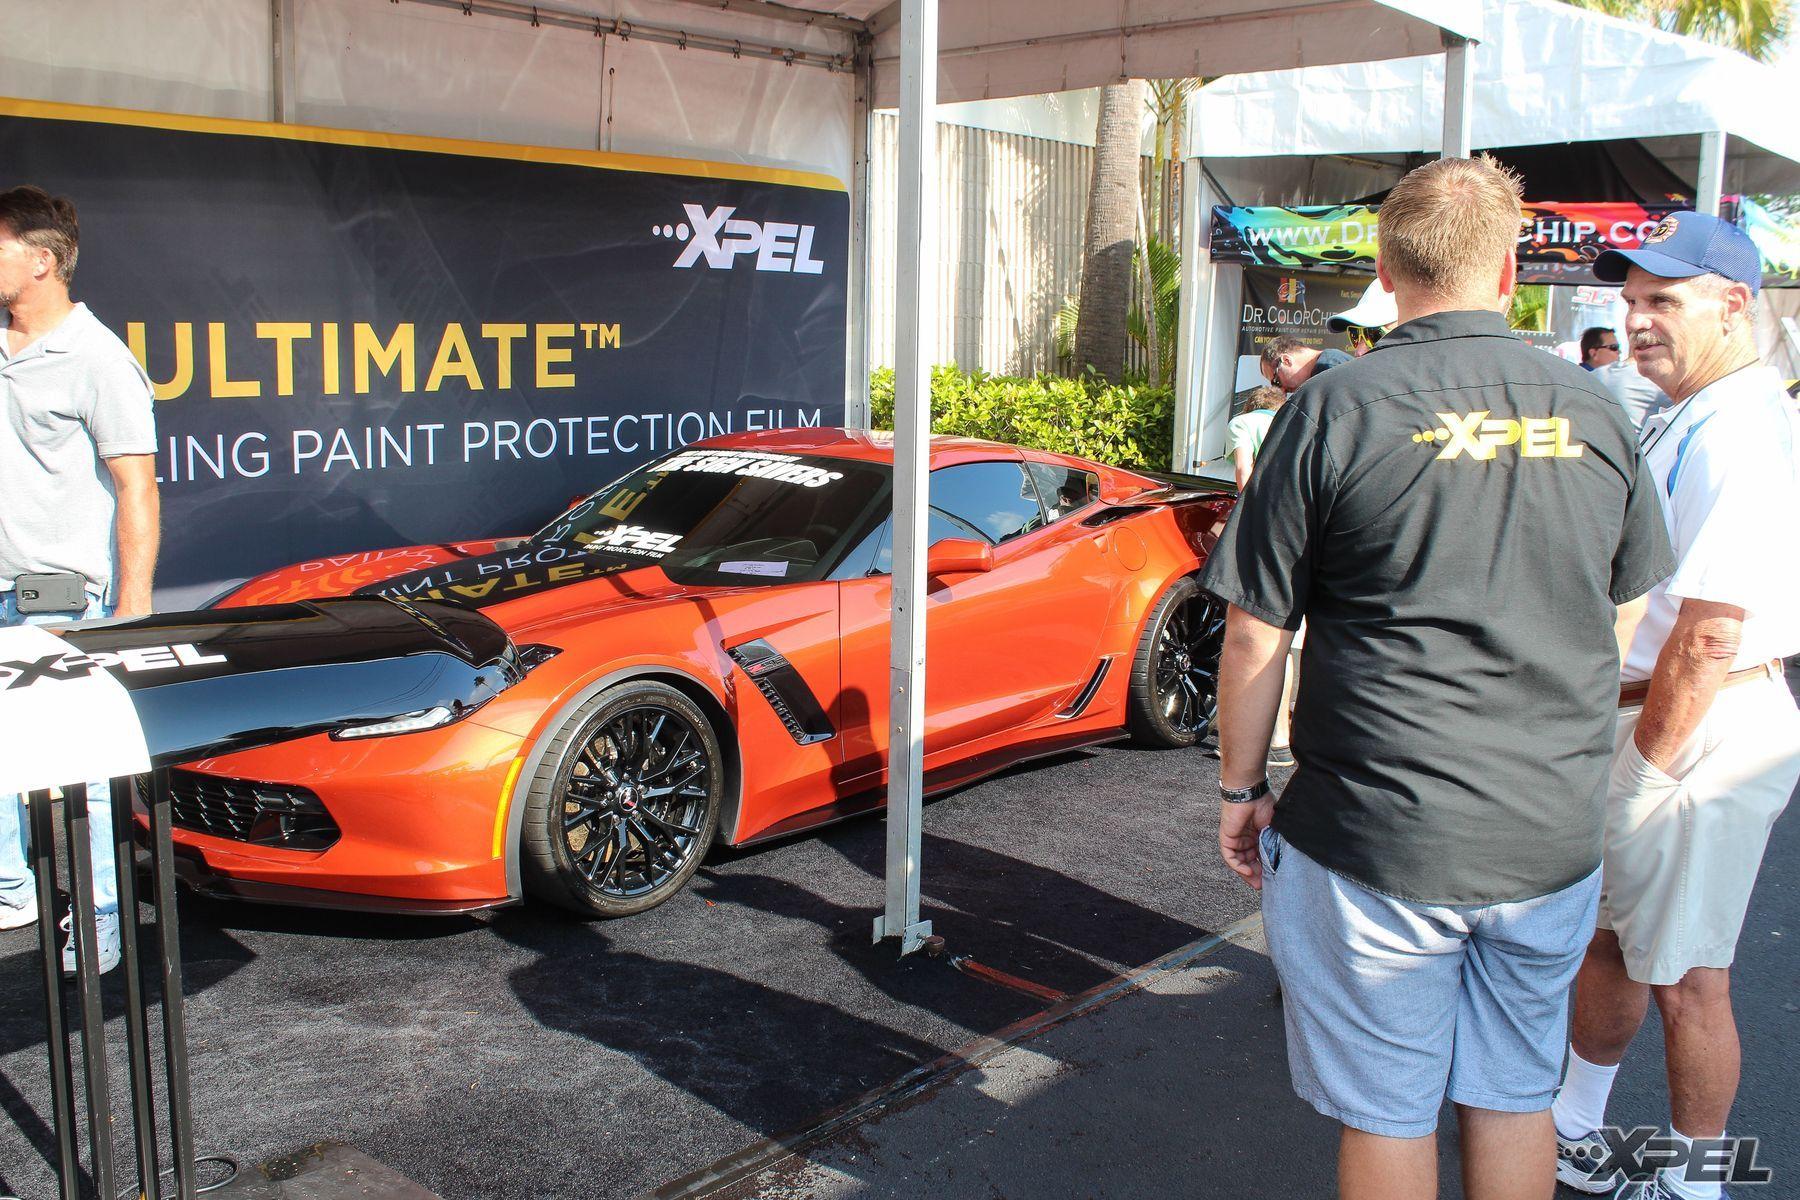 Chevrolet Corvette Z06 | XPEL Booth at Barrett Jackson West Palm Beach 2015